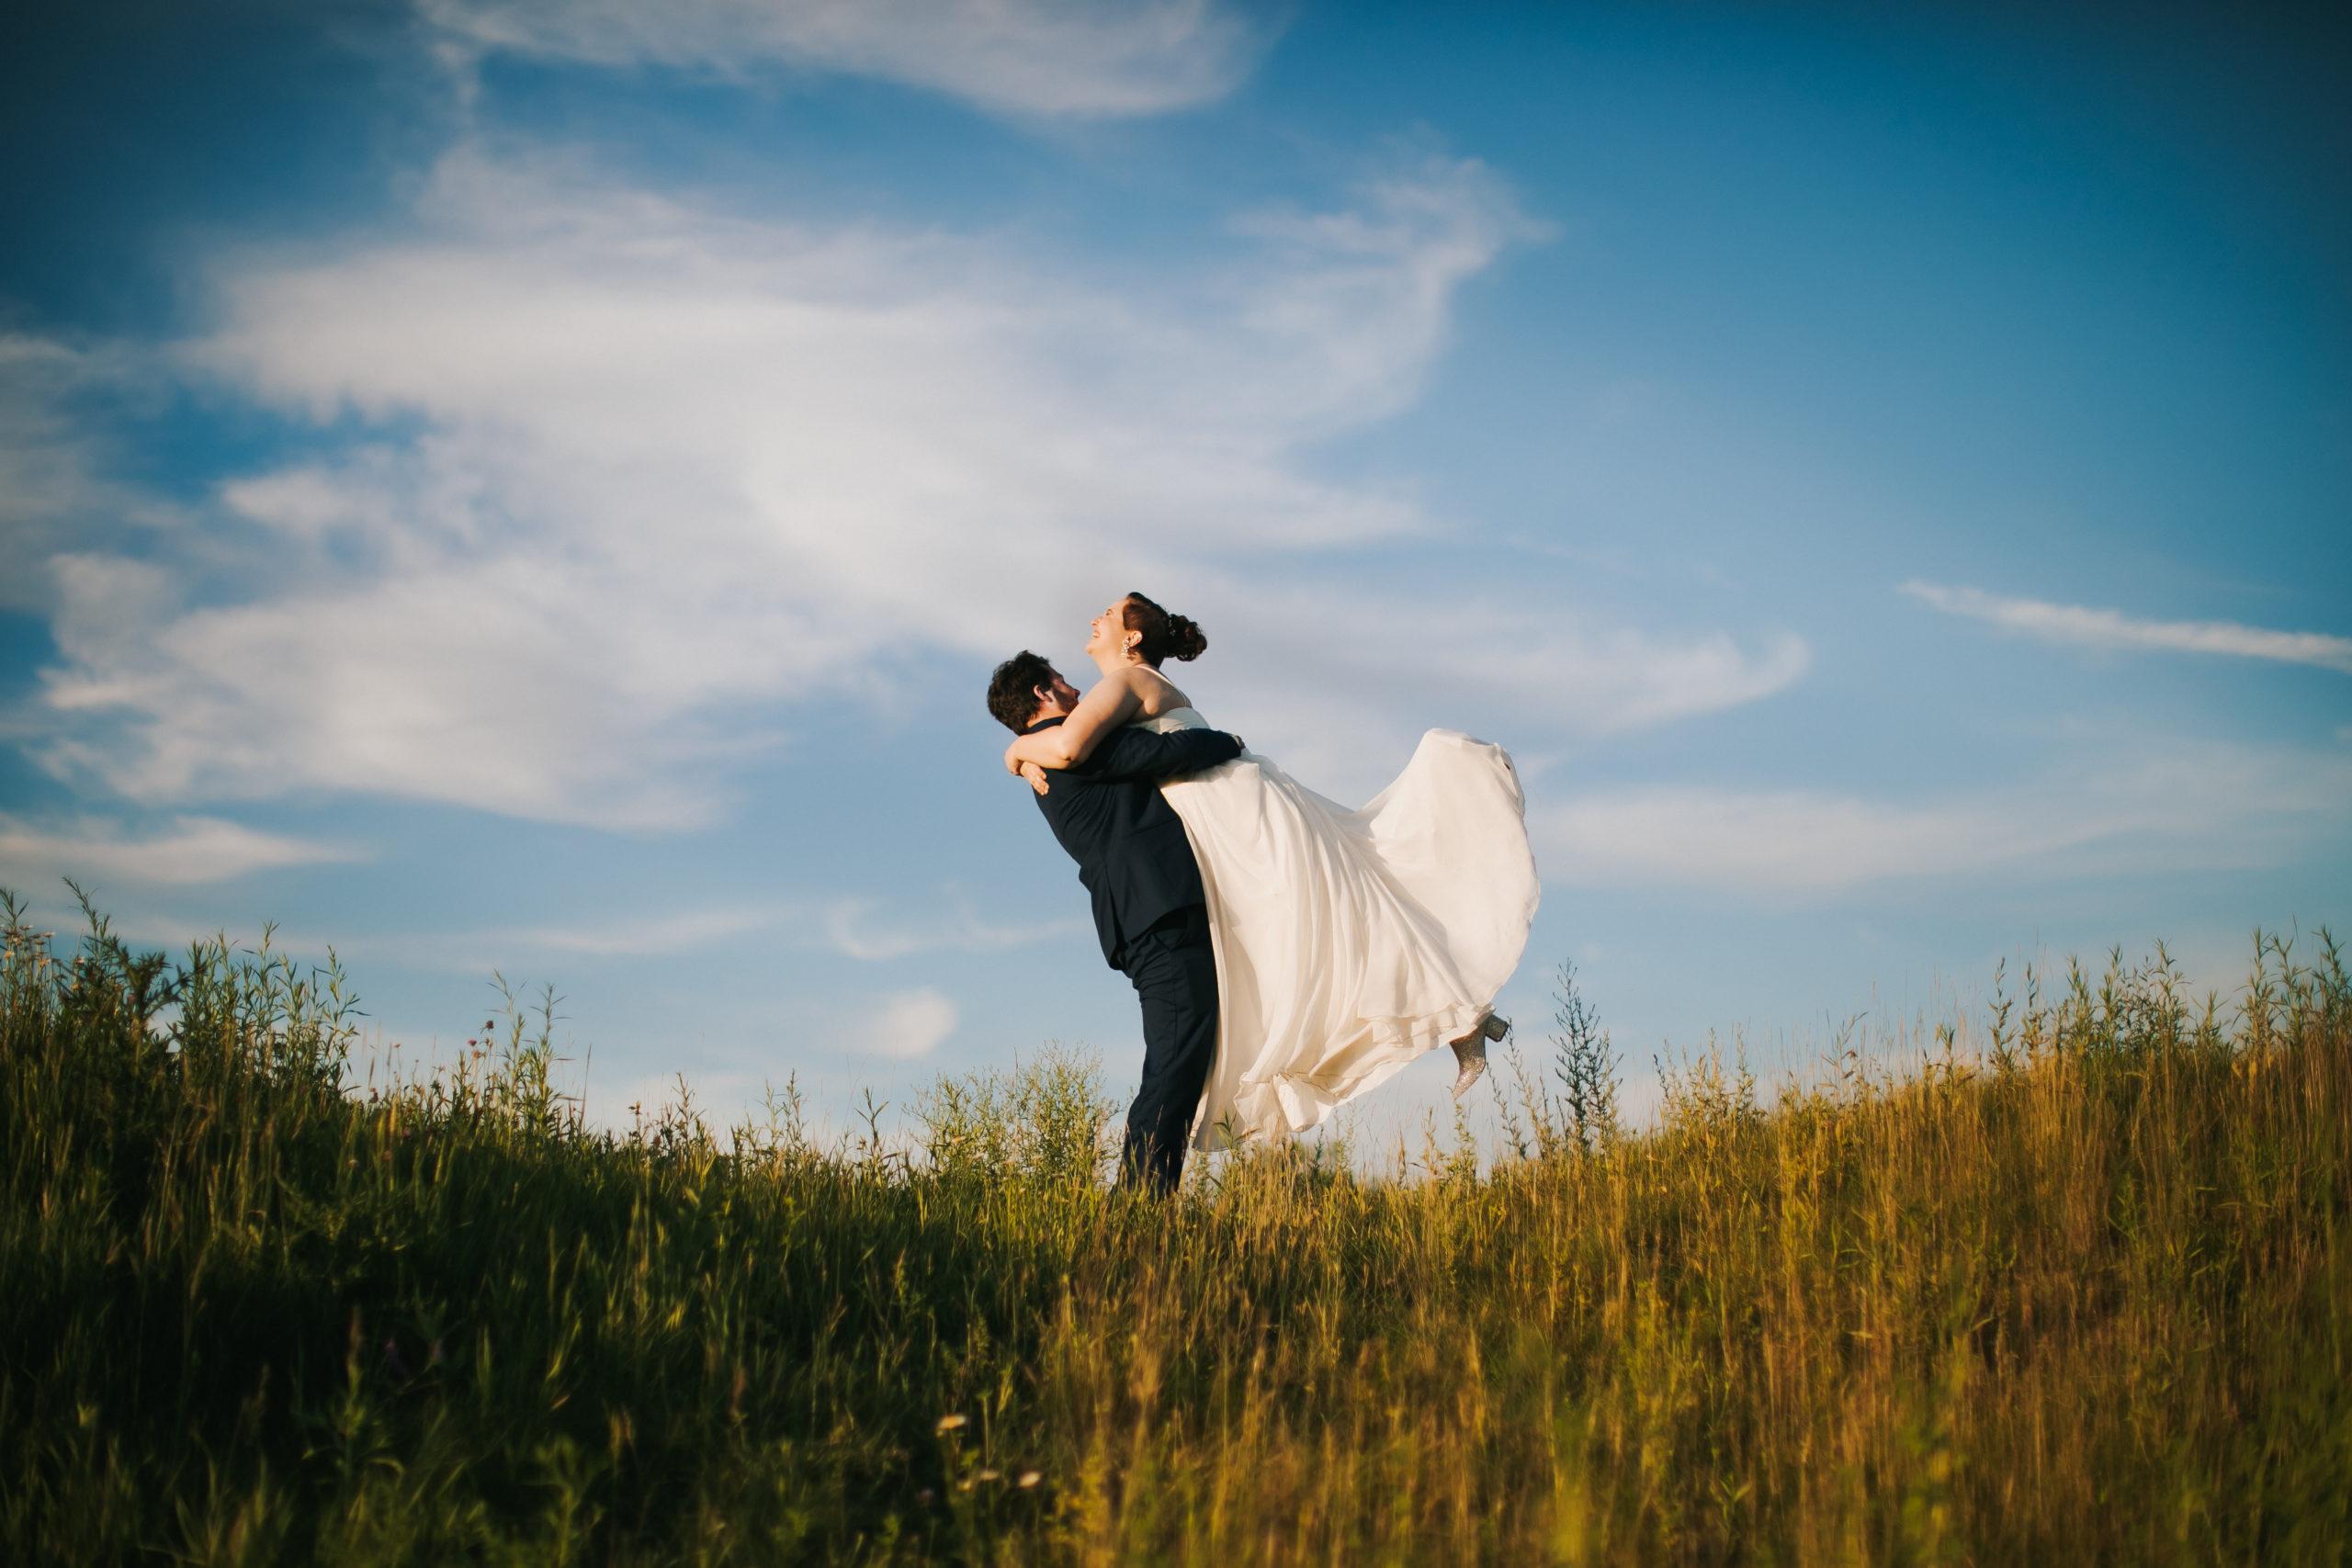 A groom picks up his bride